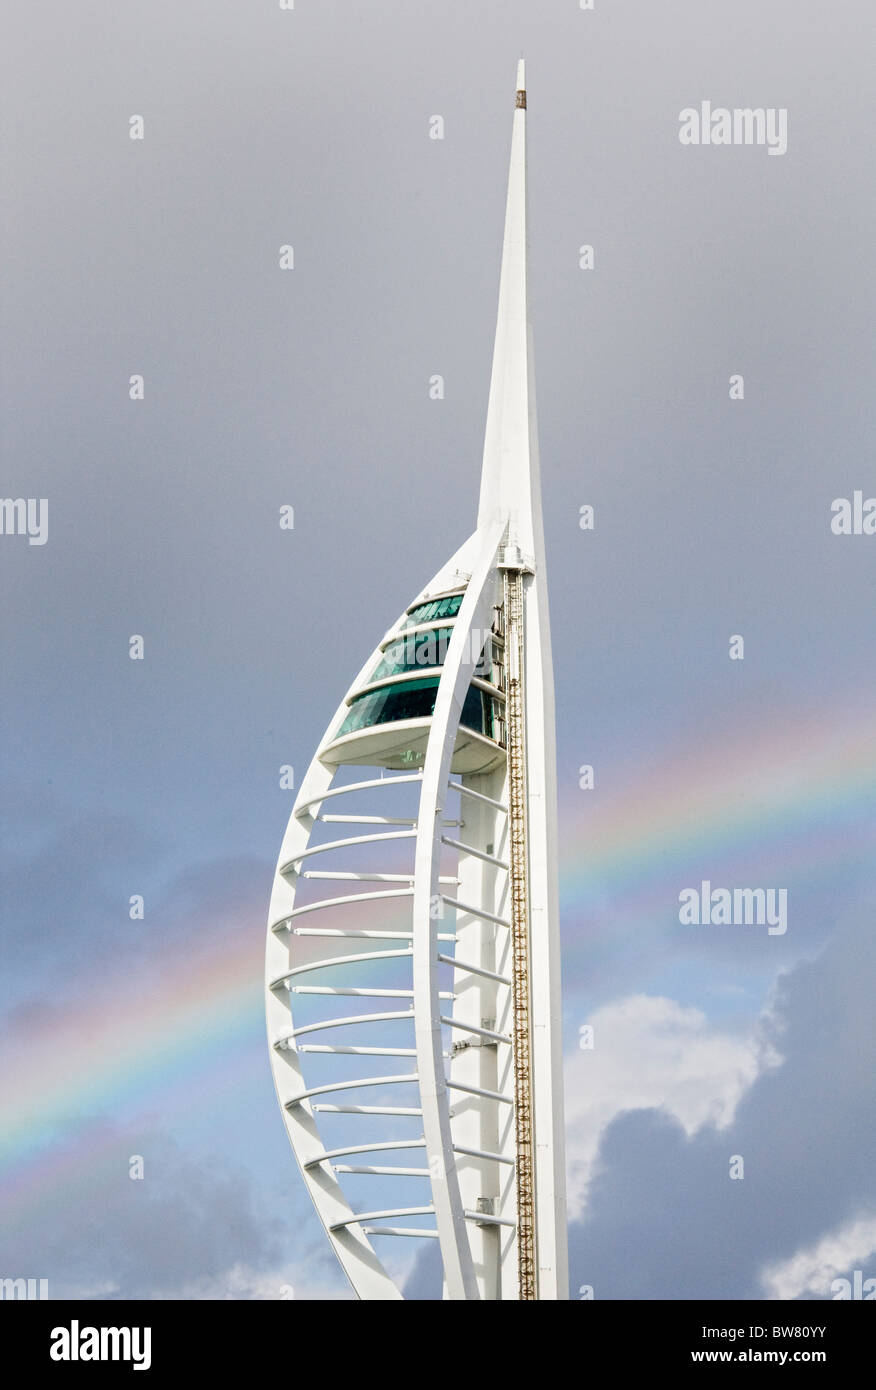 Spinnaker Tower 4 - Stock Image